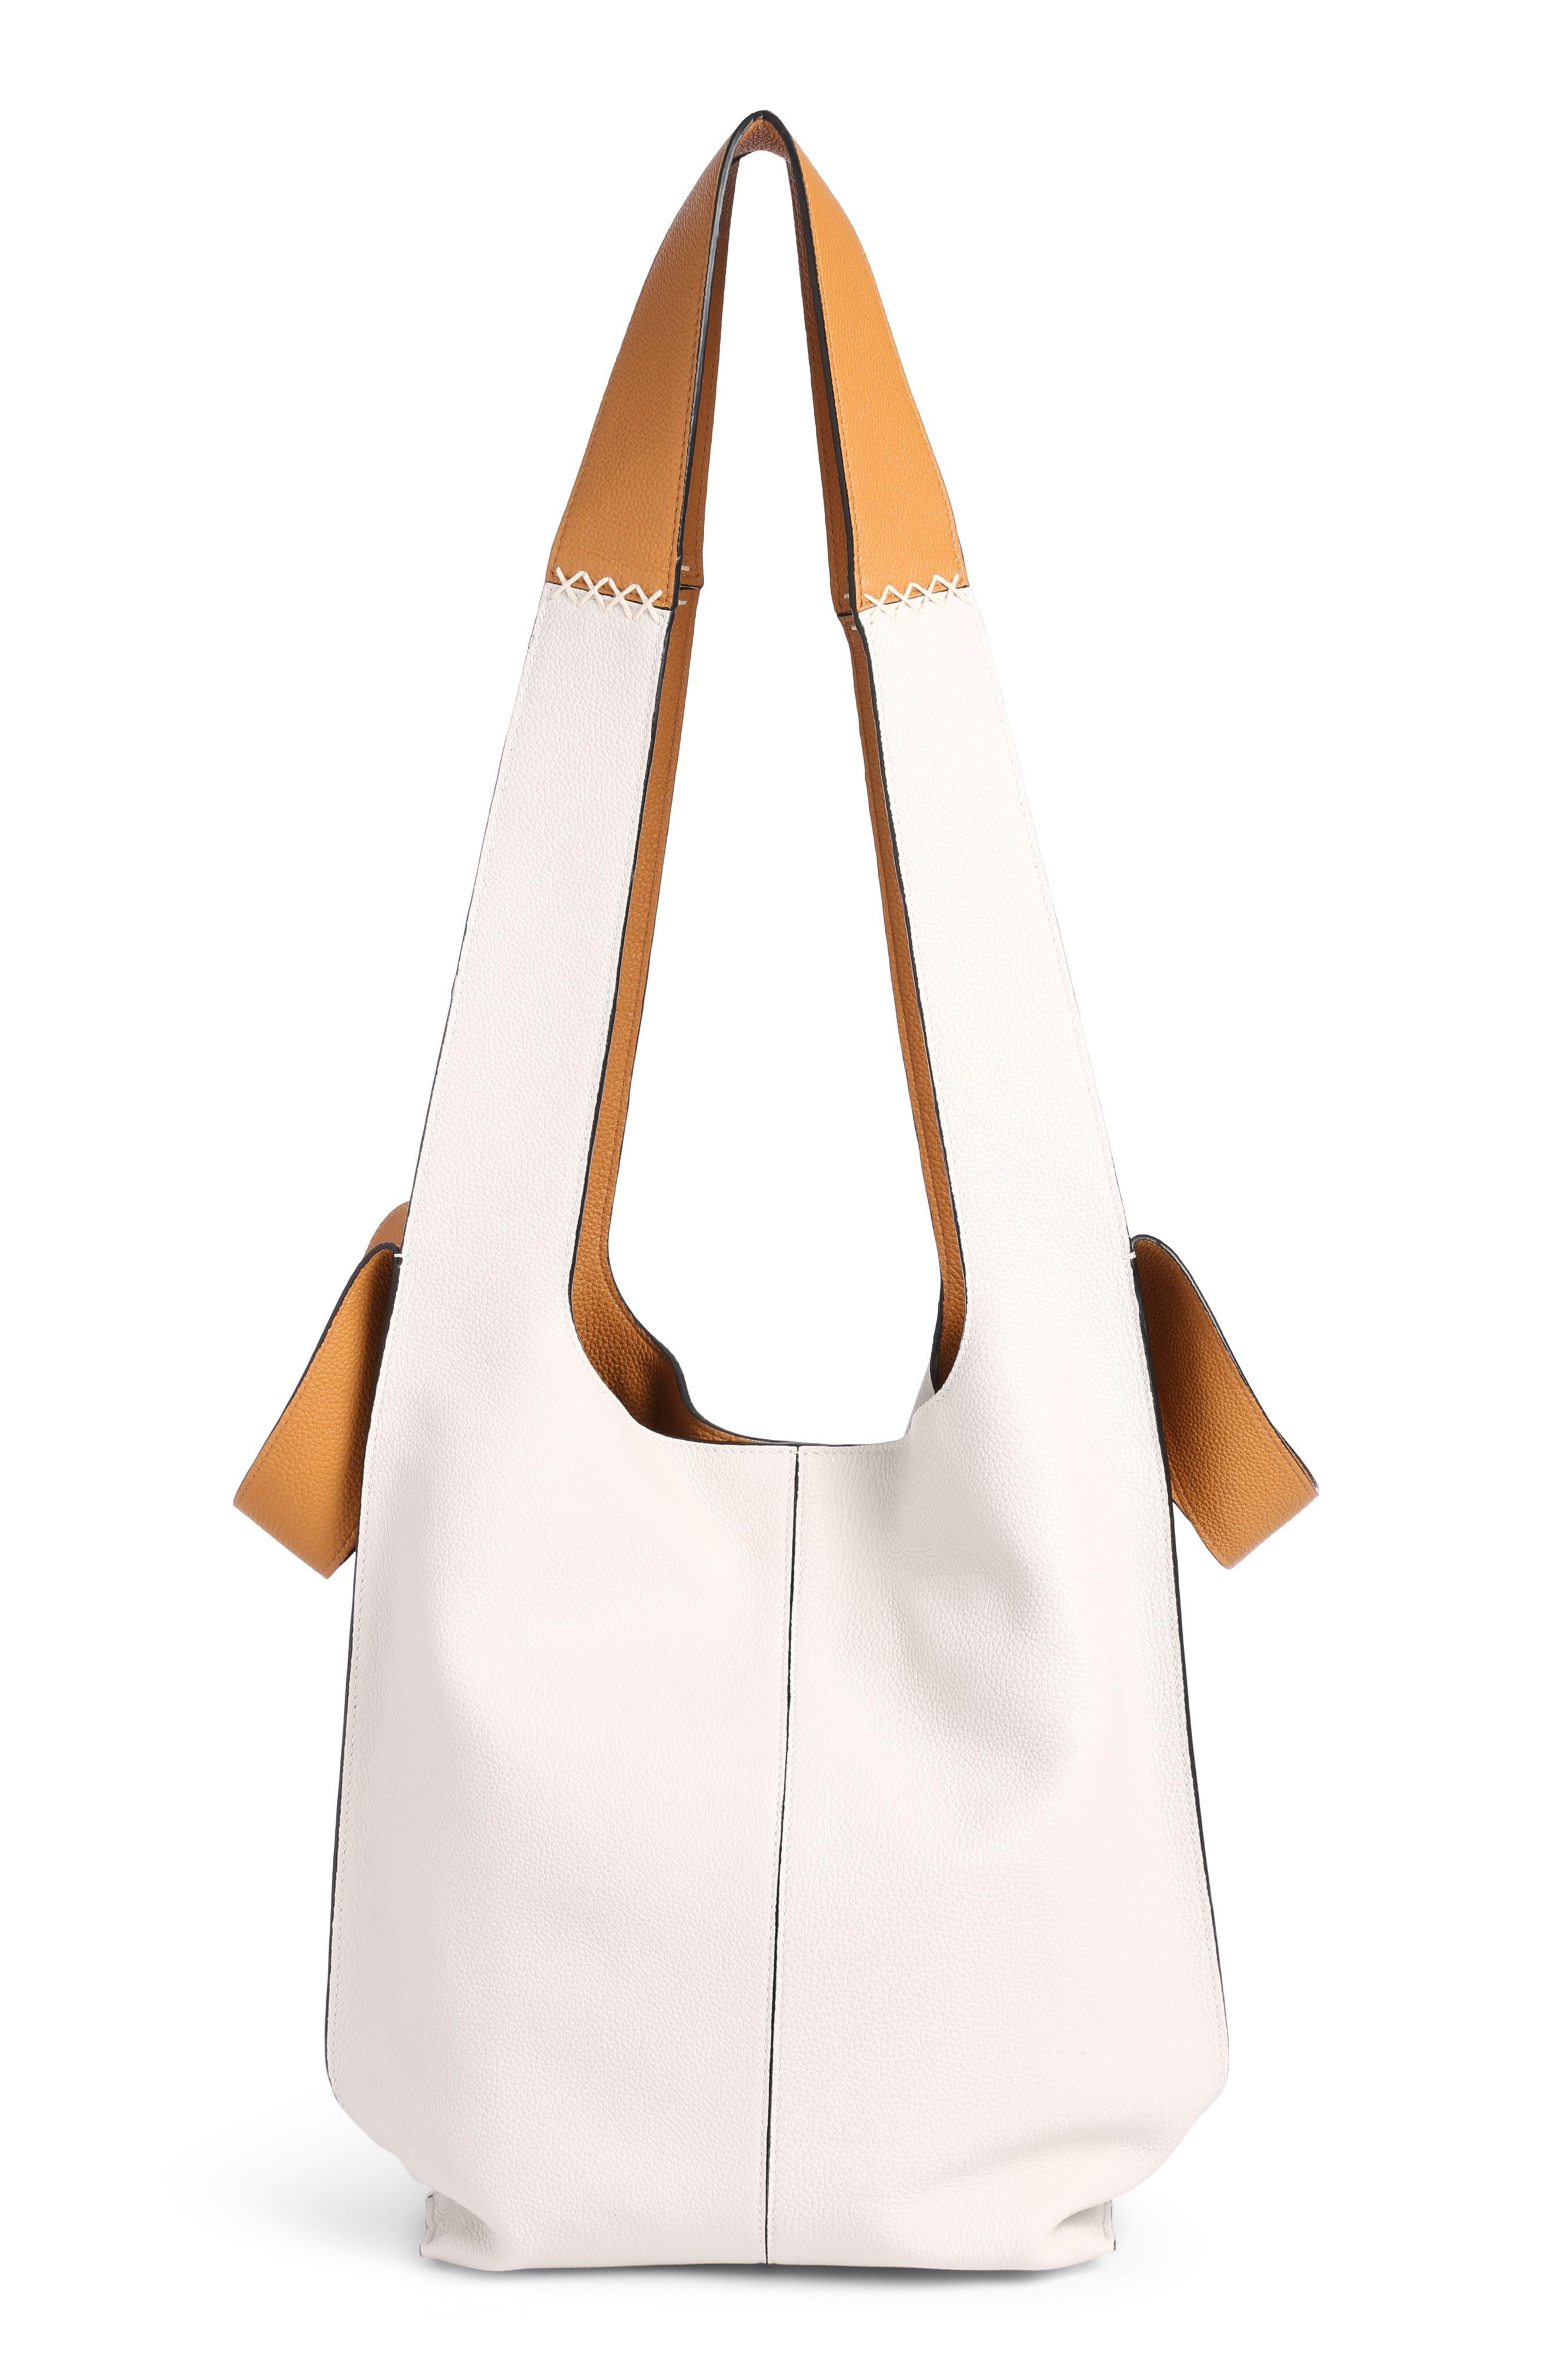 Leather Hobo Tote Bag,                             Alternate thumbnail 2, color,                             Soft White/ Amber